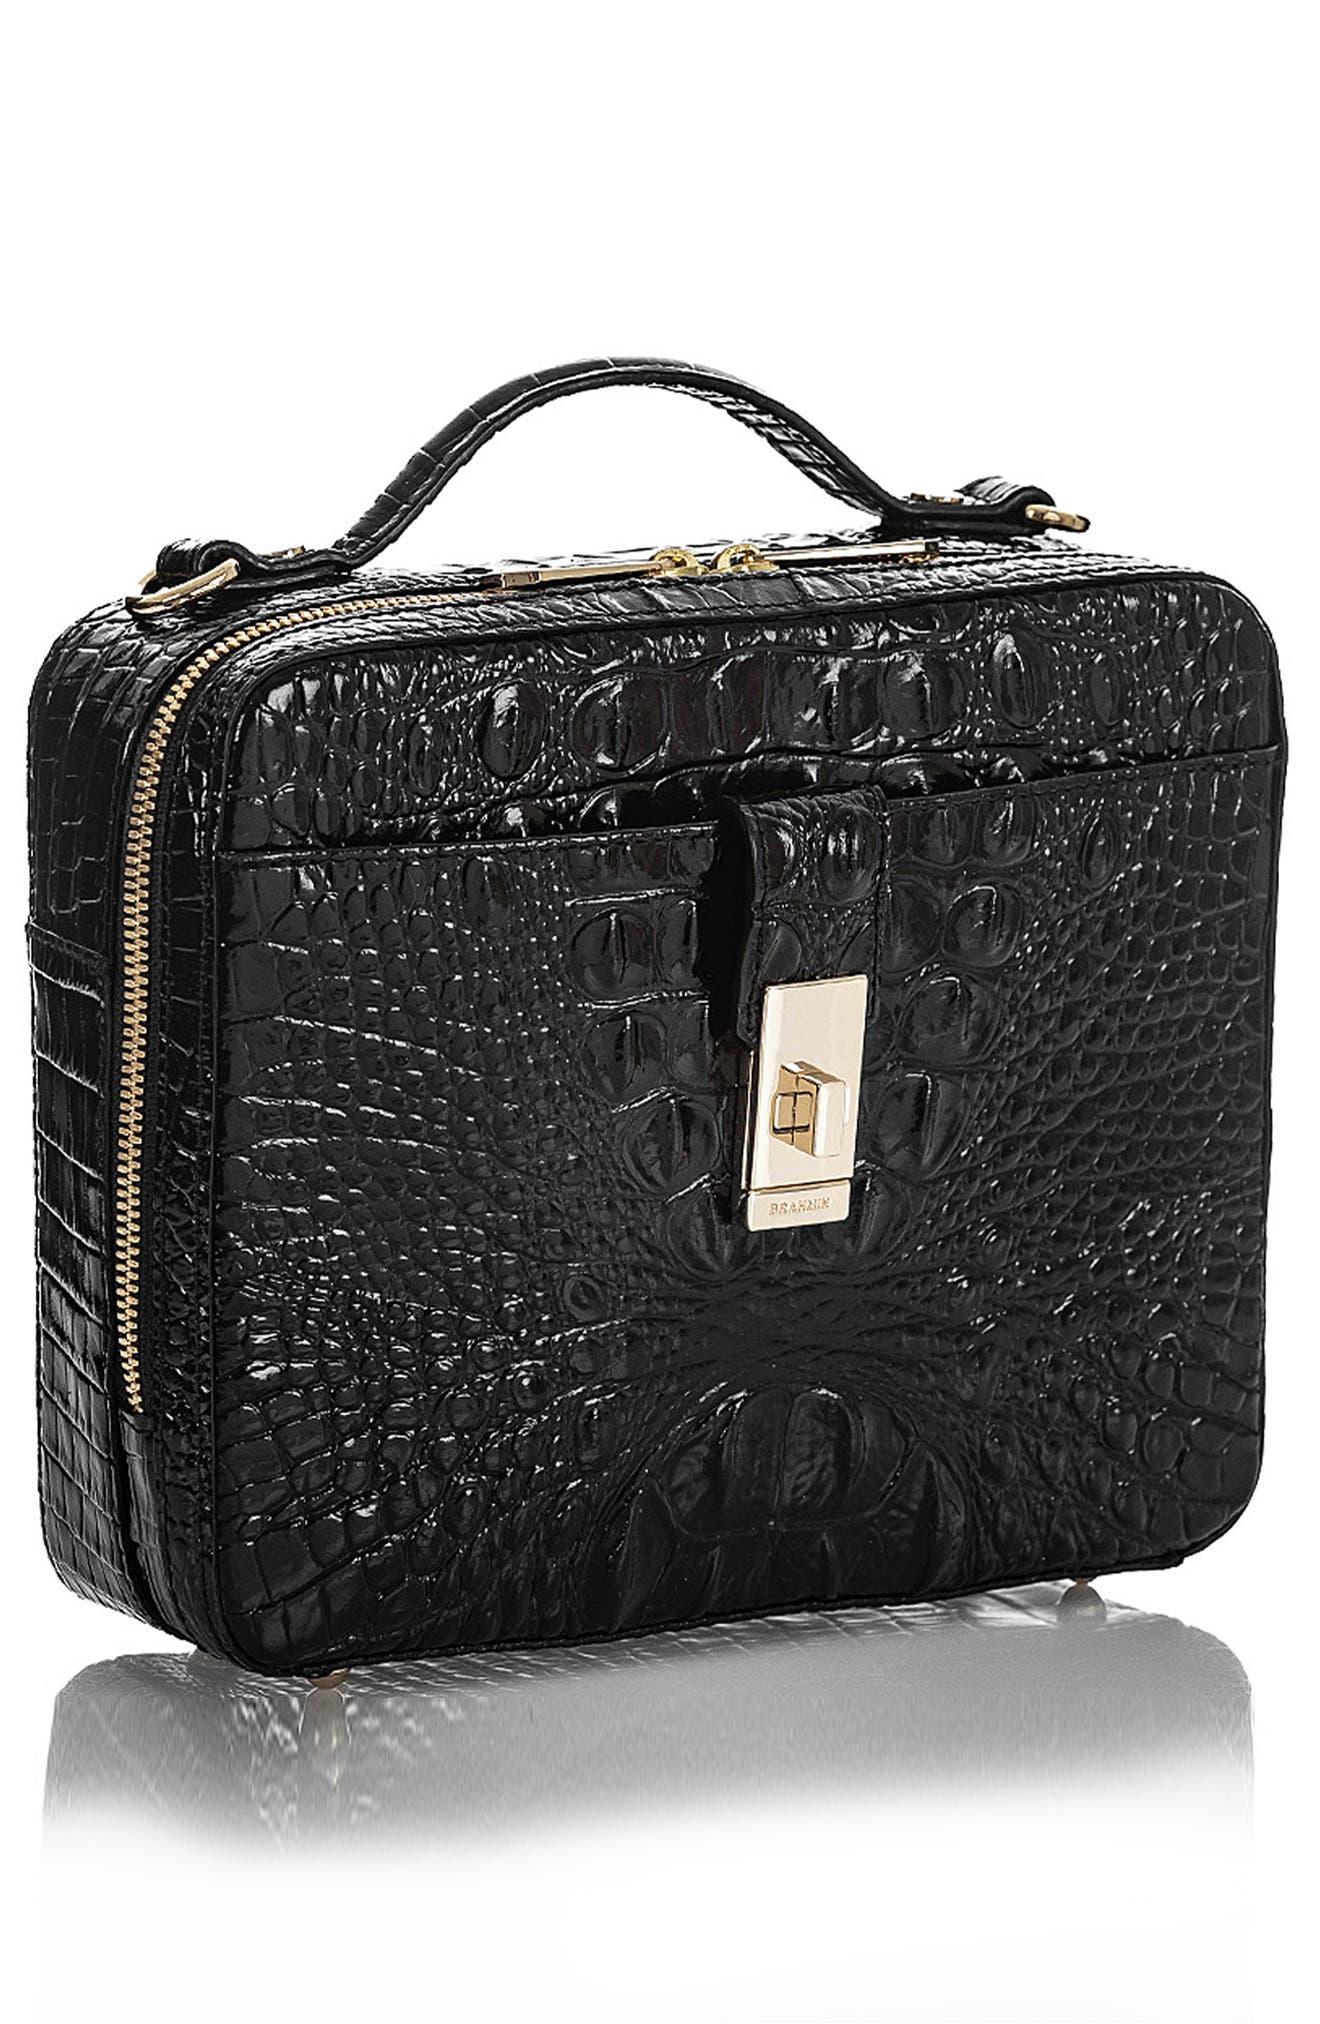 Evie Croc Embossed Leather Top Handle Bag,                             Alternate thumbnail 4, color,                             BLACK MEMBOURNE